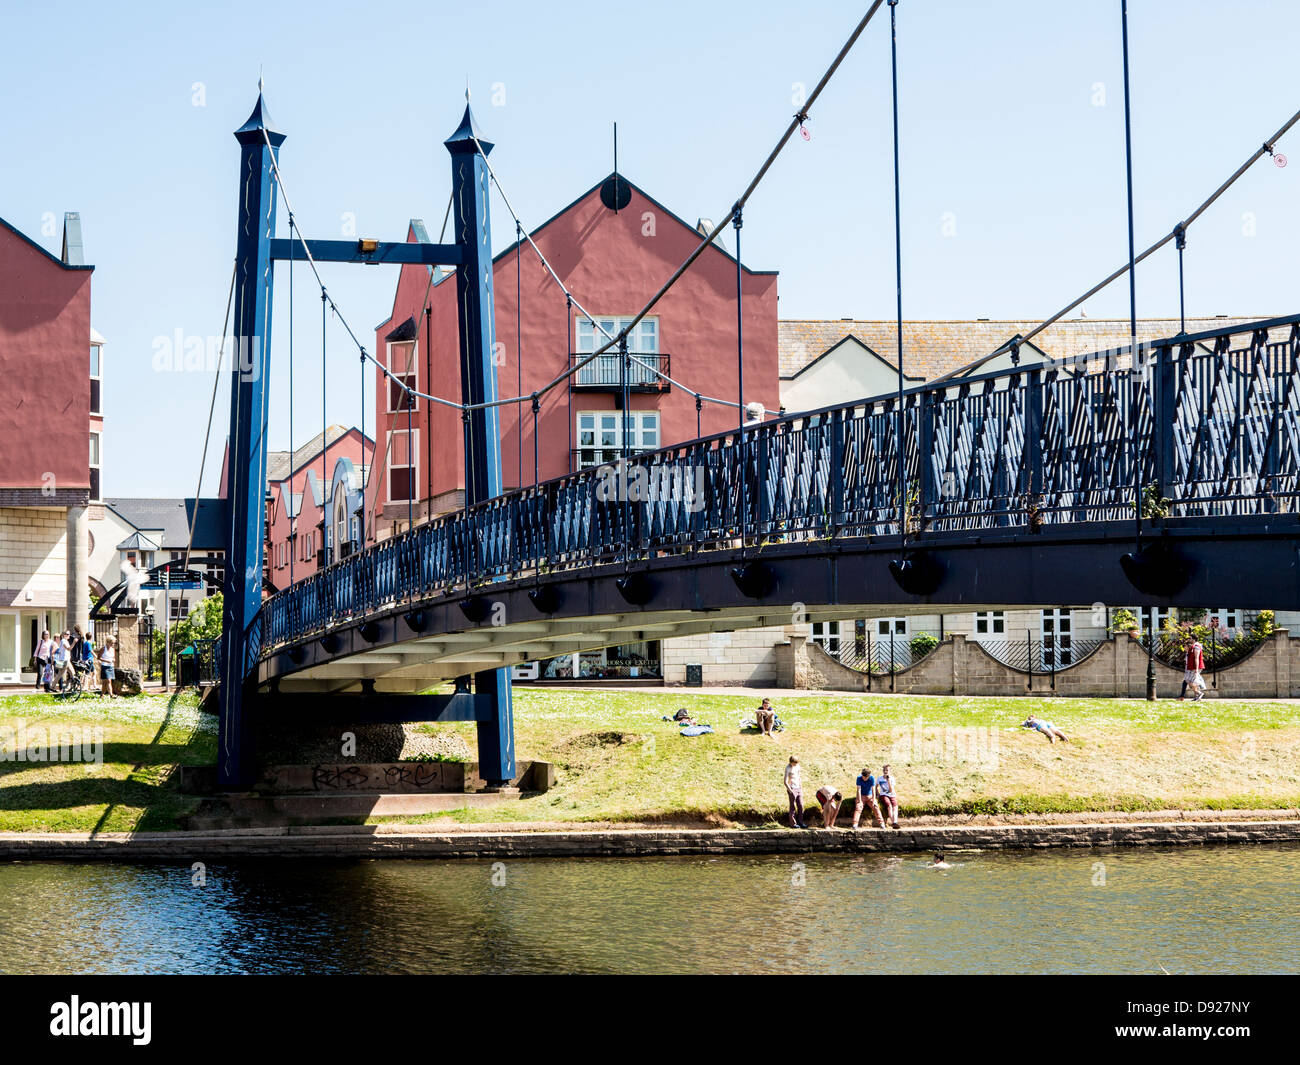 Suspension bridge over the river Exe, Exeter, Devon, England - Stock Image